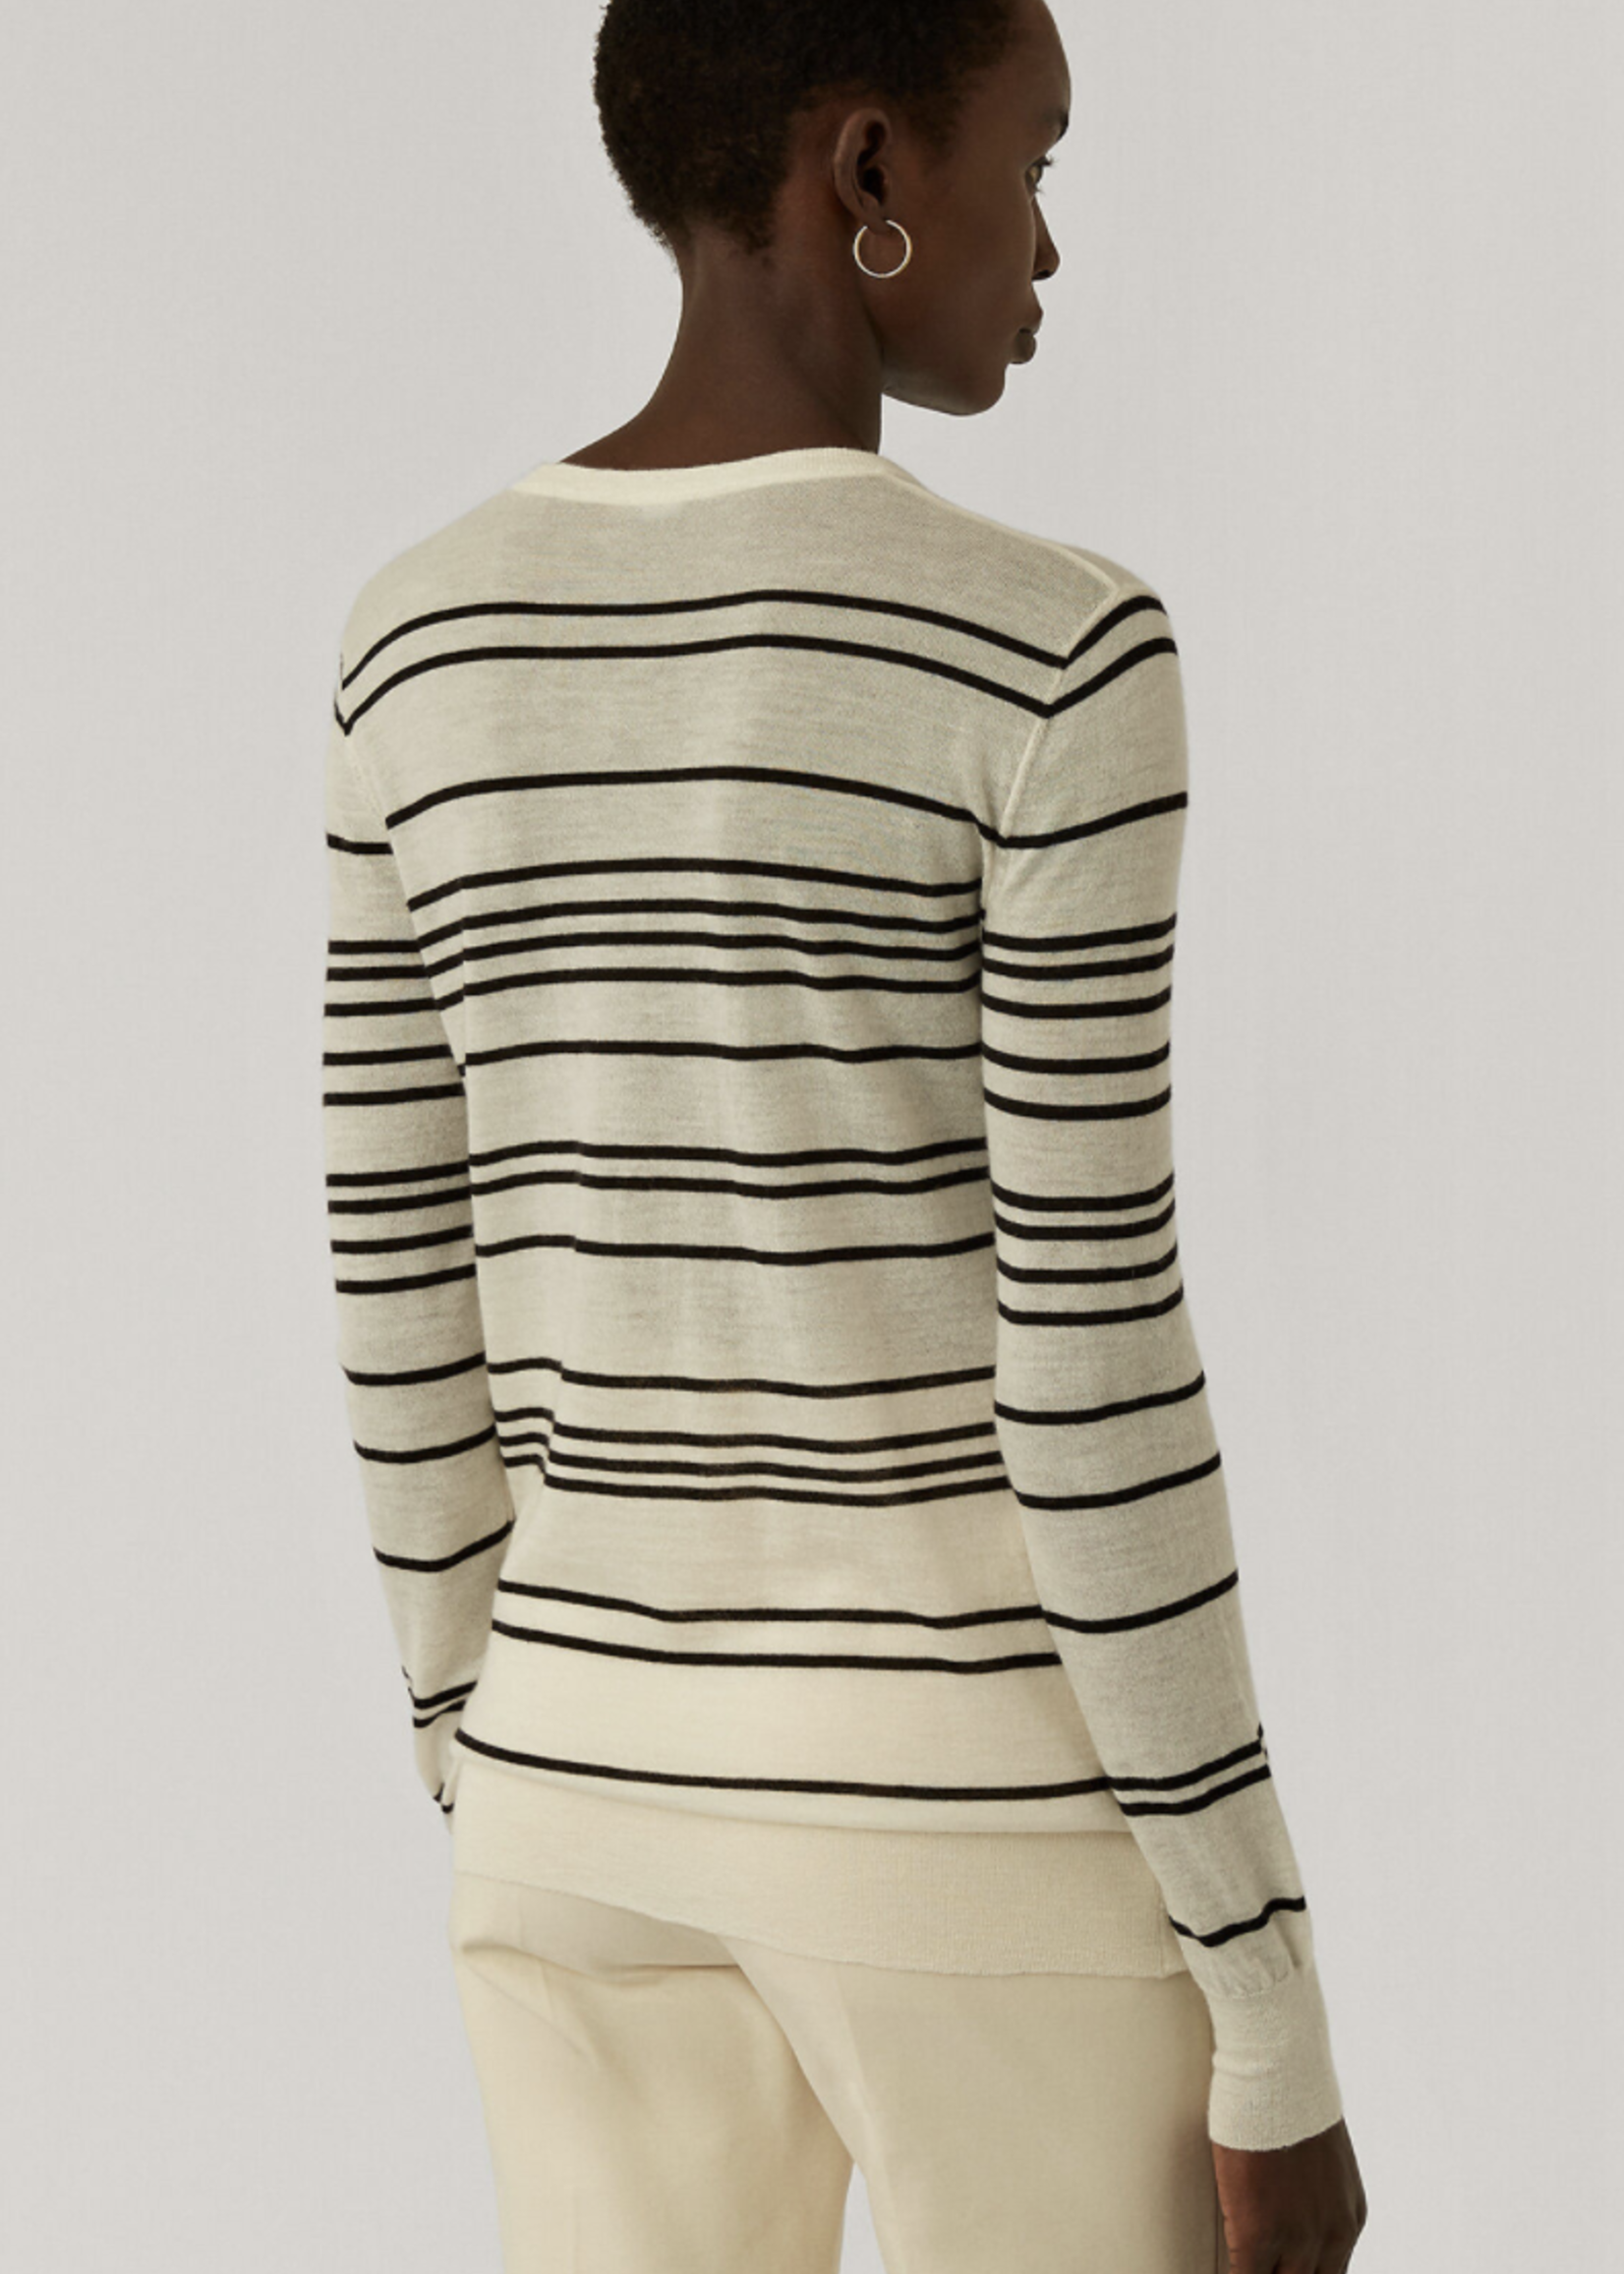 Joseph joseph rnd neck longsleeve cashmere stripe top , ivory combo